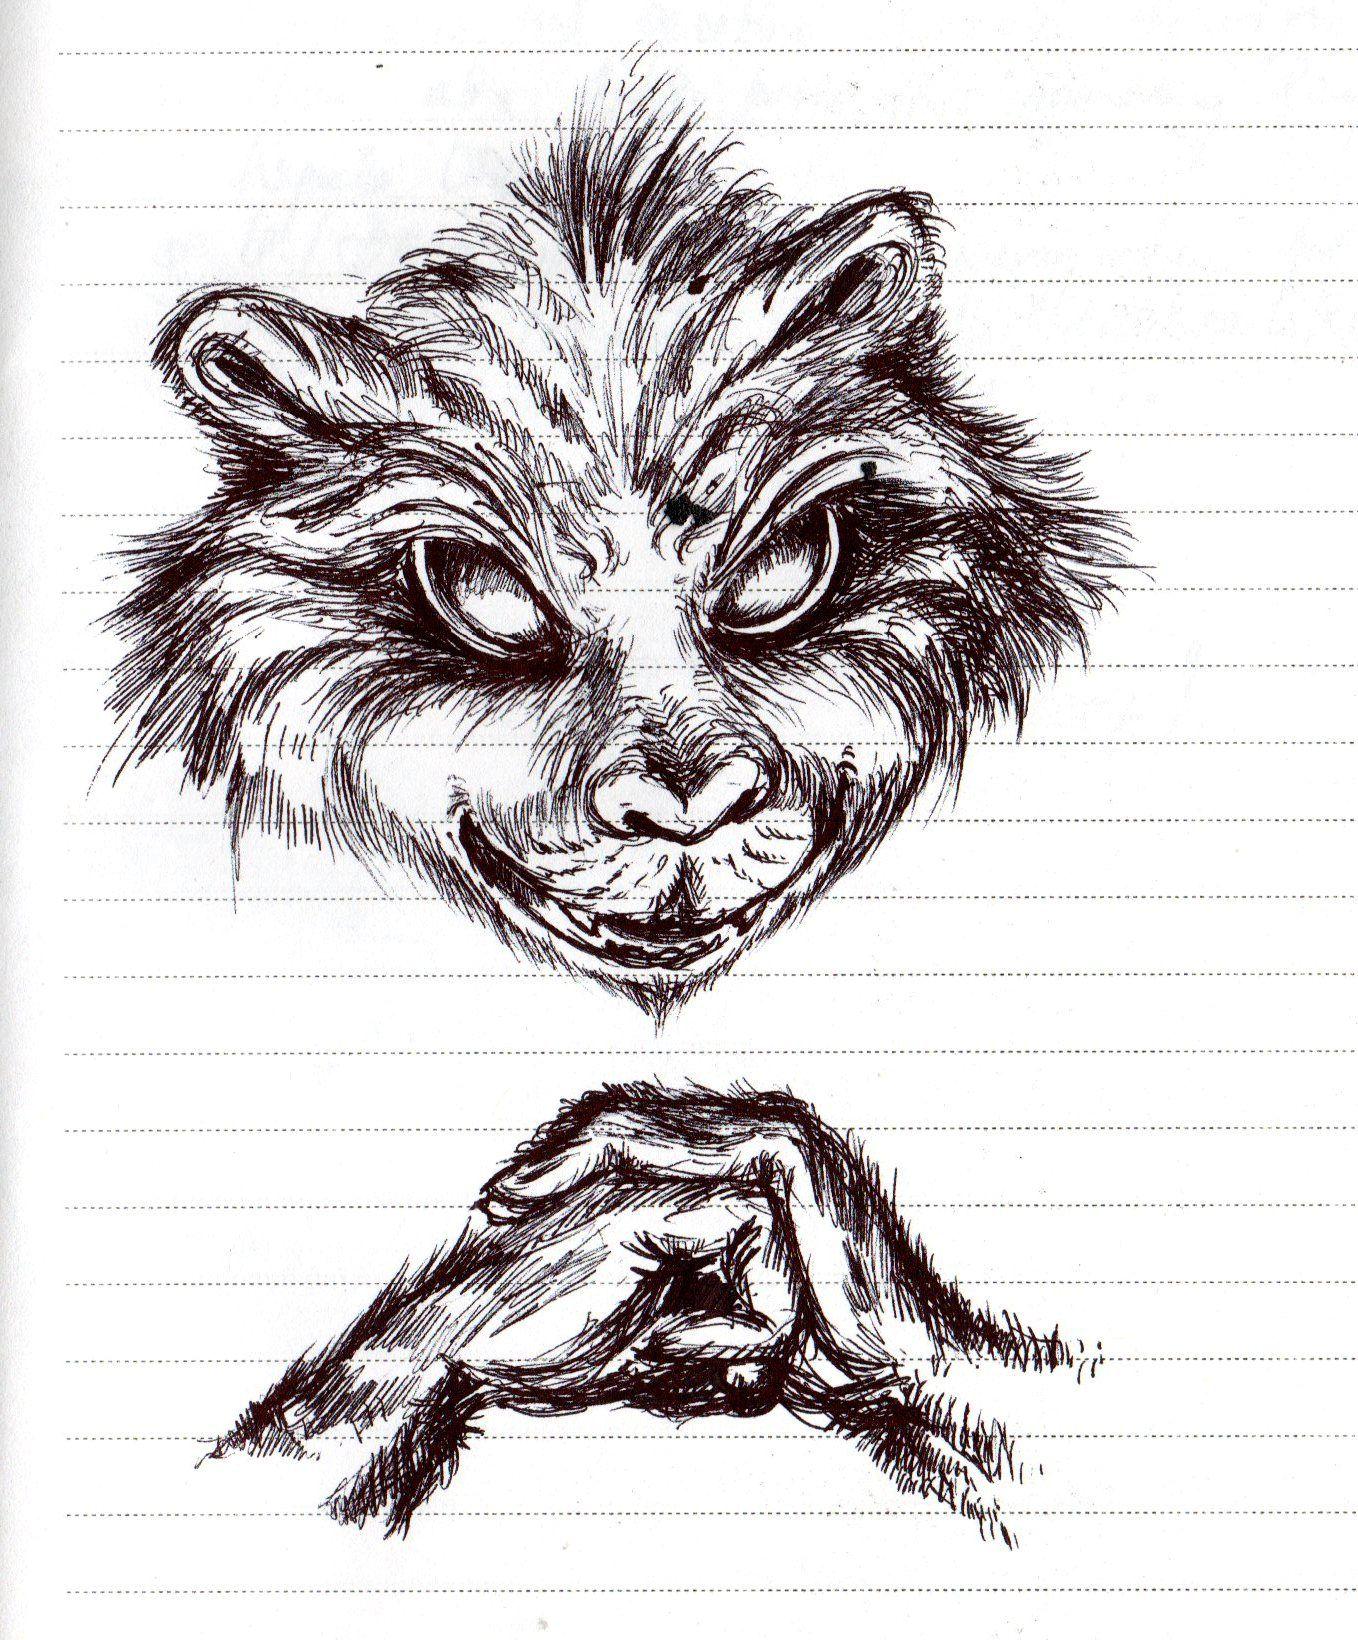 Spooky racoon racoon creatures unique sketches art croquis kunst